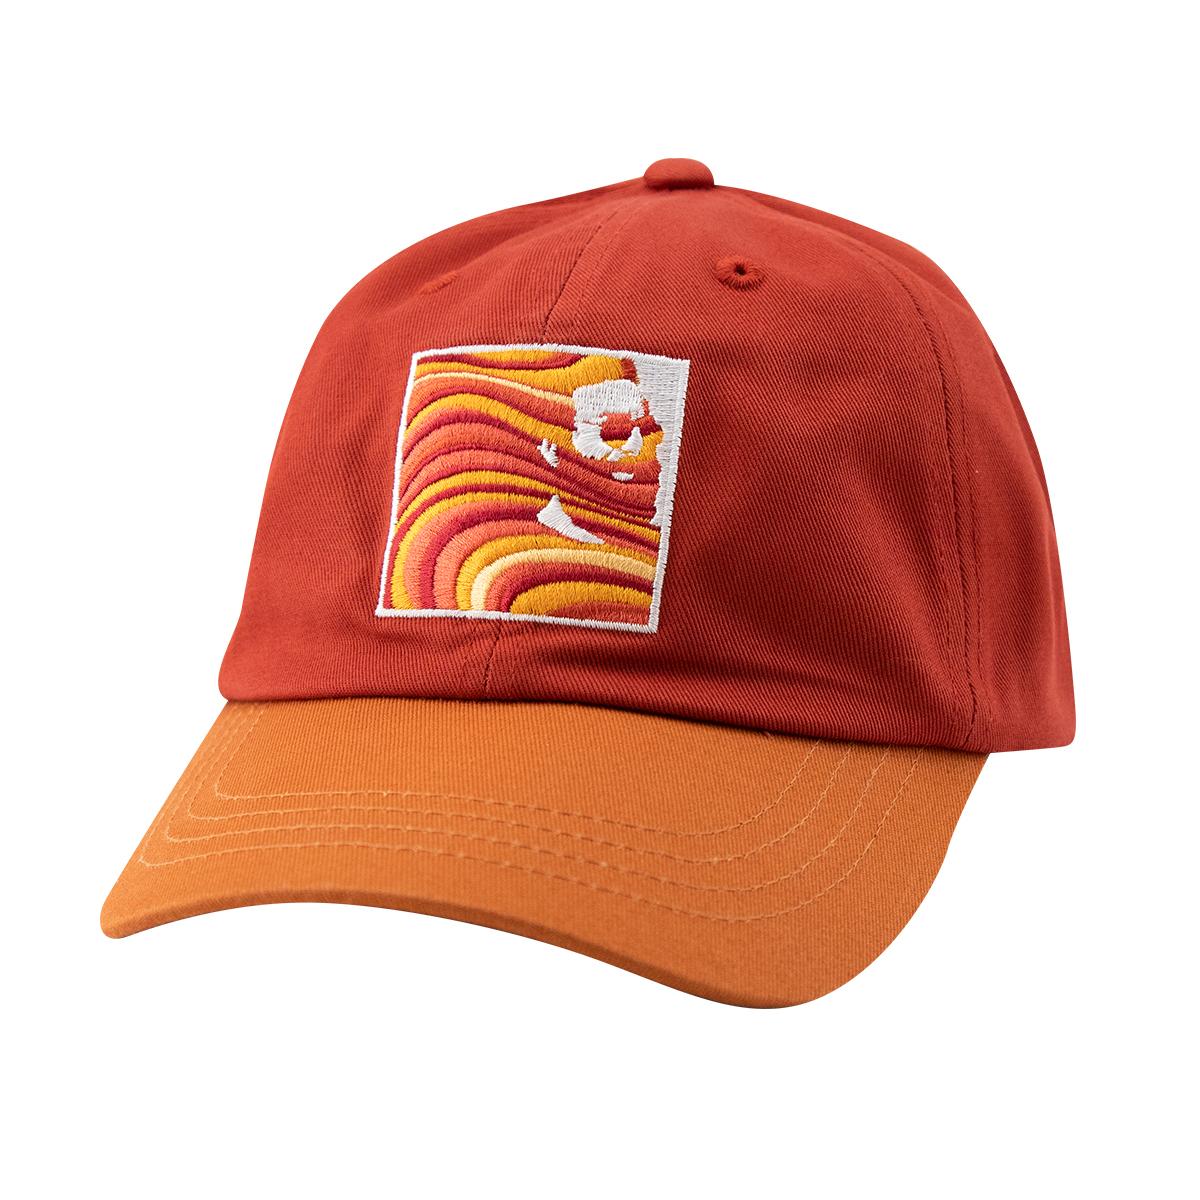 Garcia Hand Picked Dad Hat in Maroon